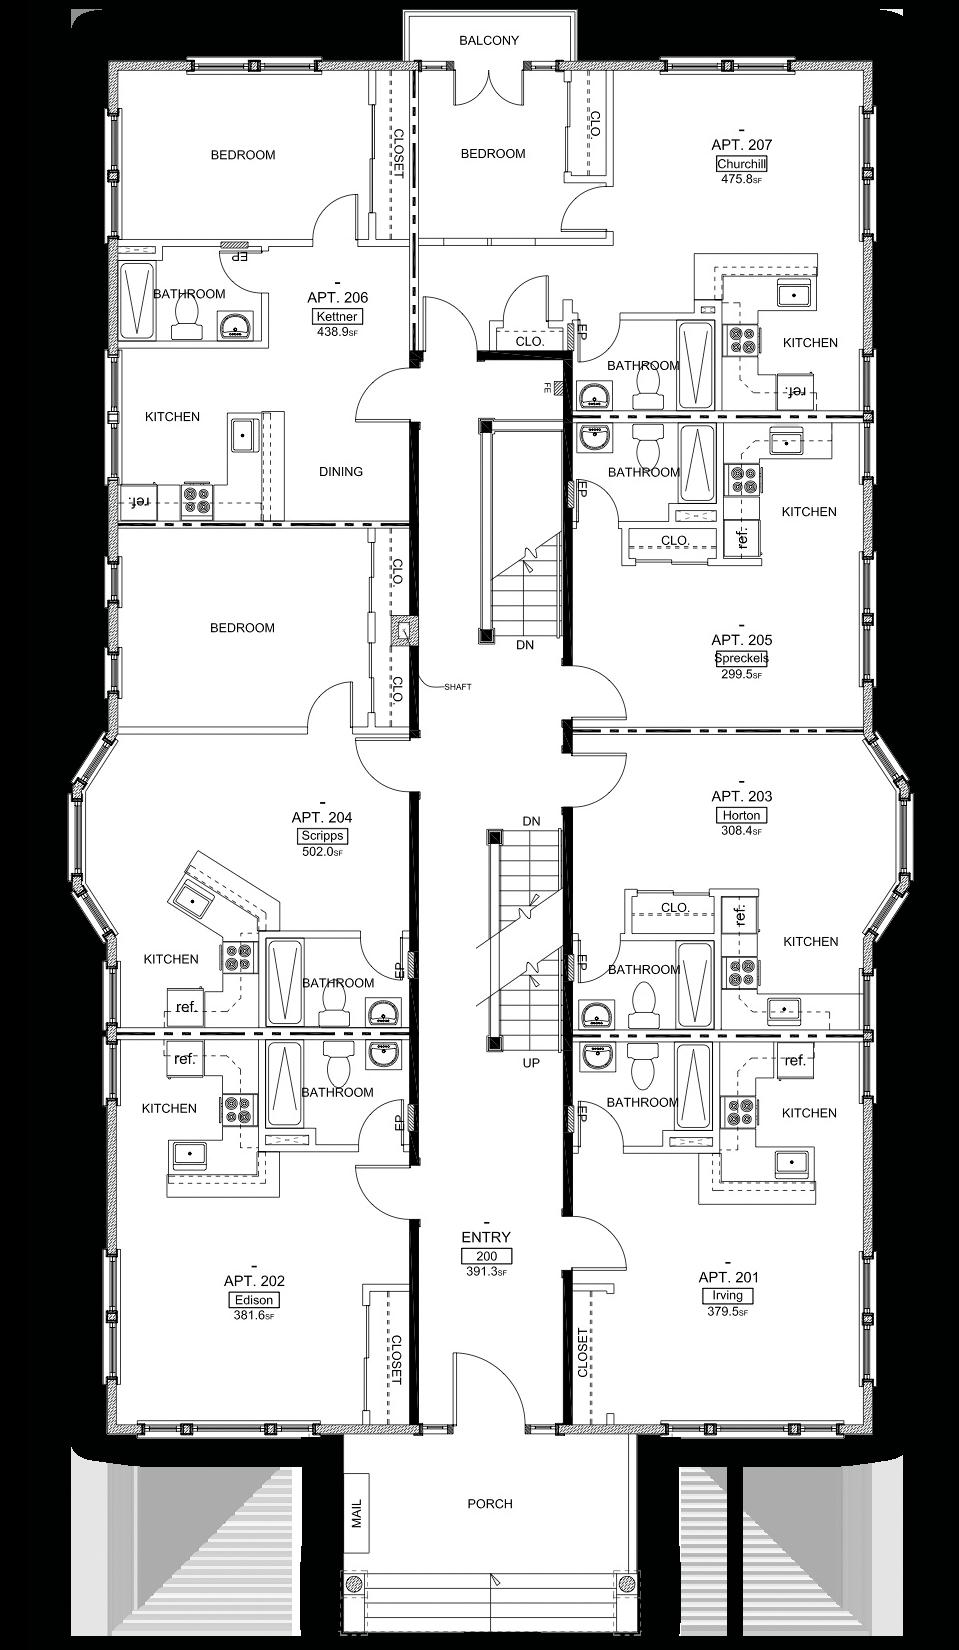 OVERALL FLOOR PLAN 2.png